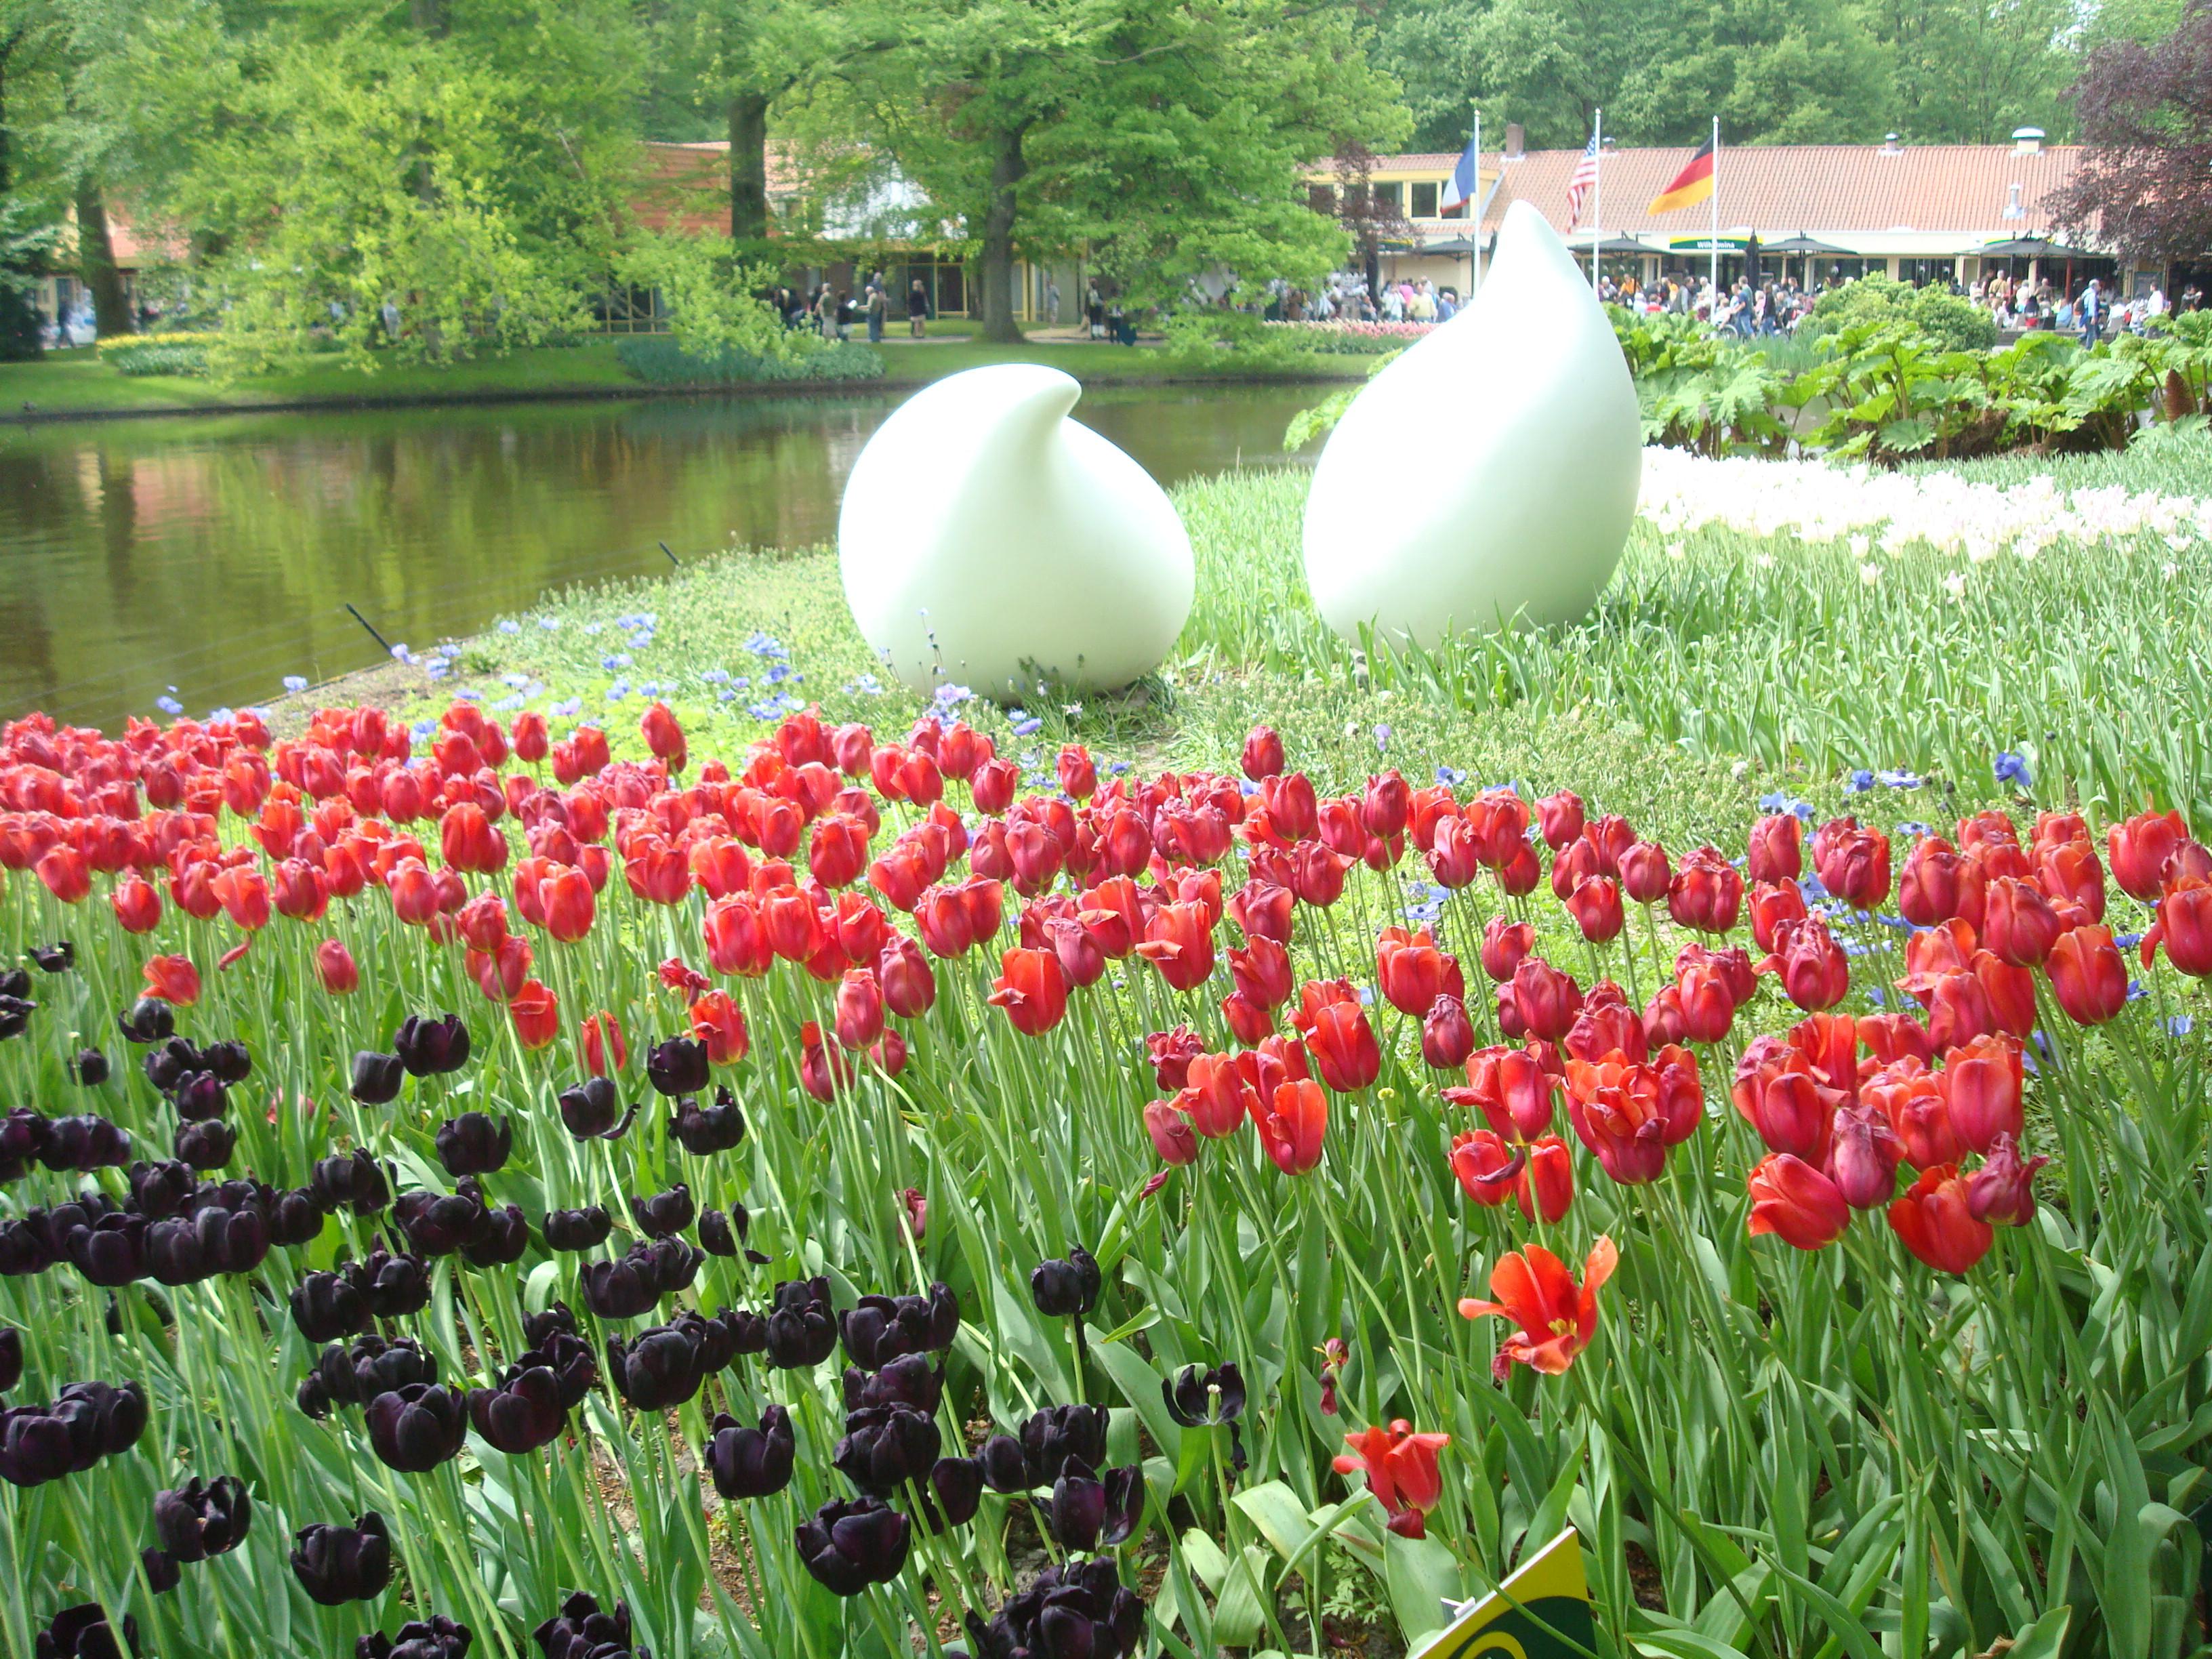 Tulips At Keukenhof Gardens In Amsterdam